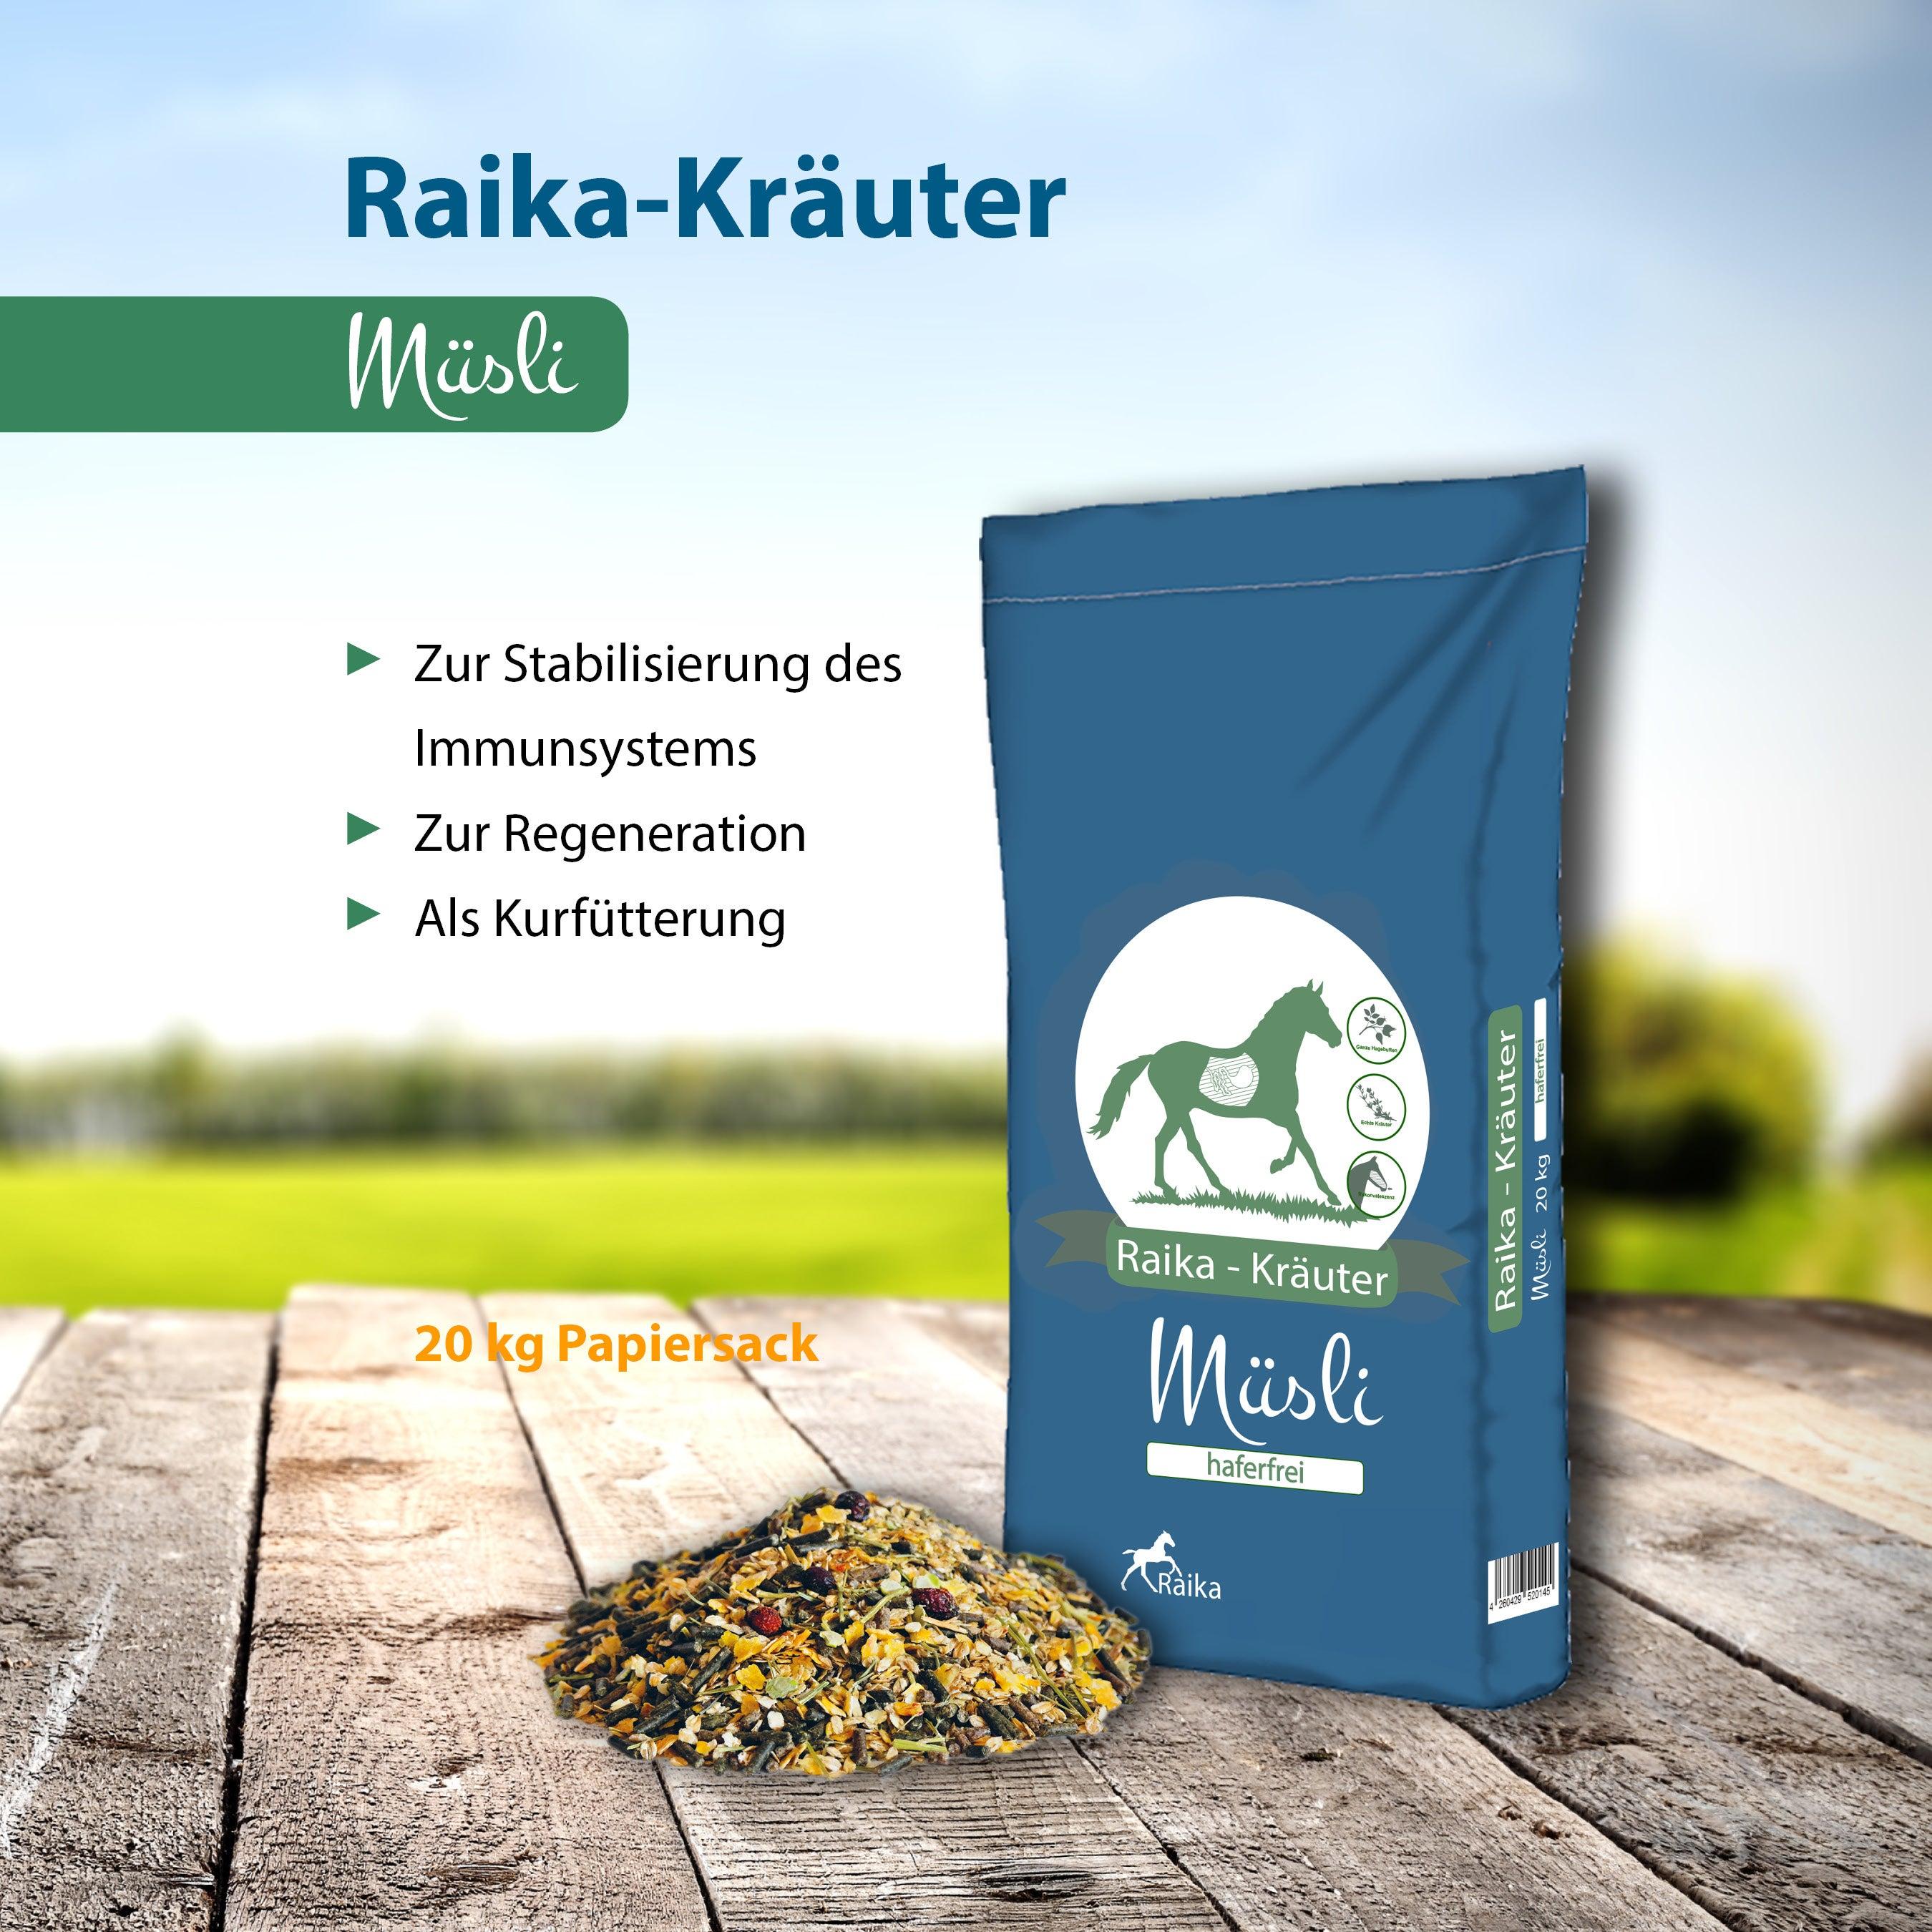 Raika-Kräuter Müsli Pferdefutter